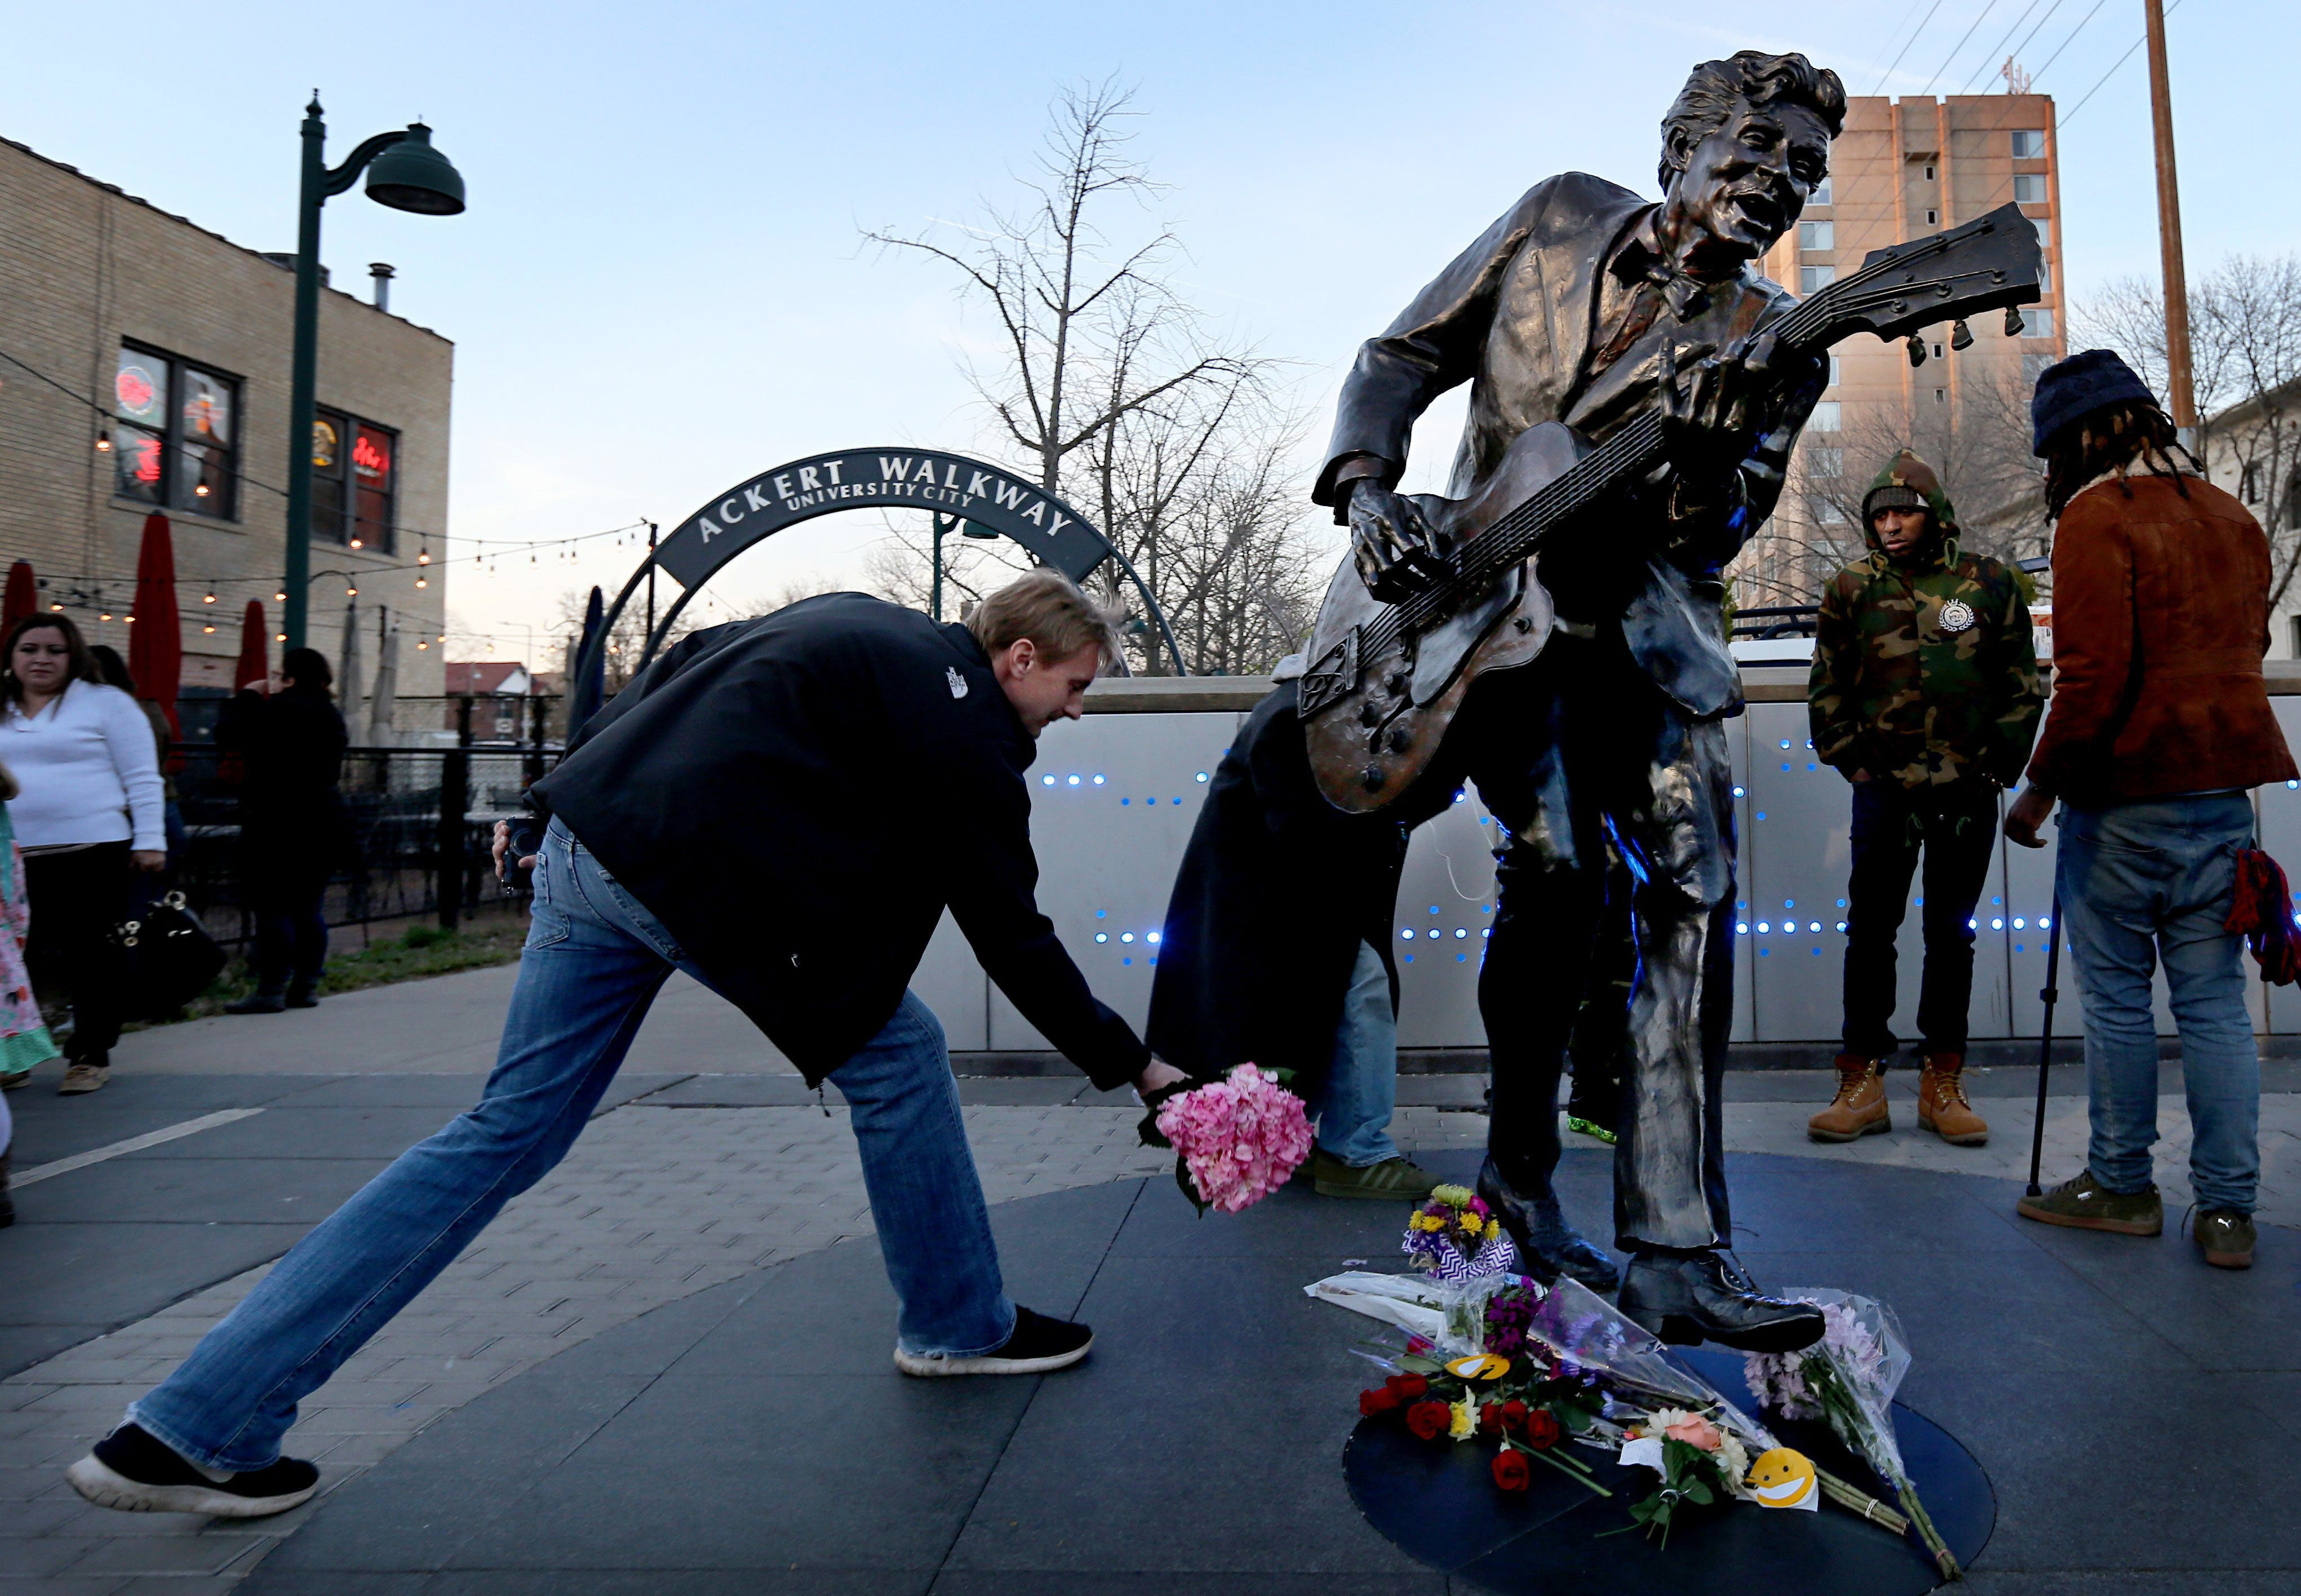 Rock 'n' Roll-Legende Chuck Berry ist 90-jährig gestorben.